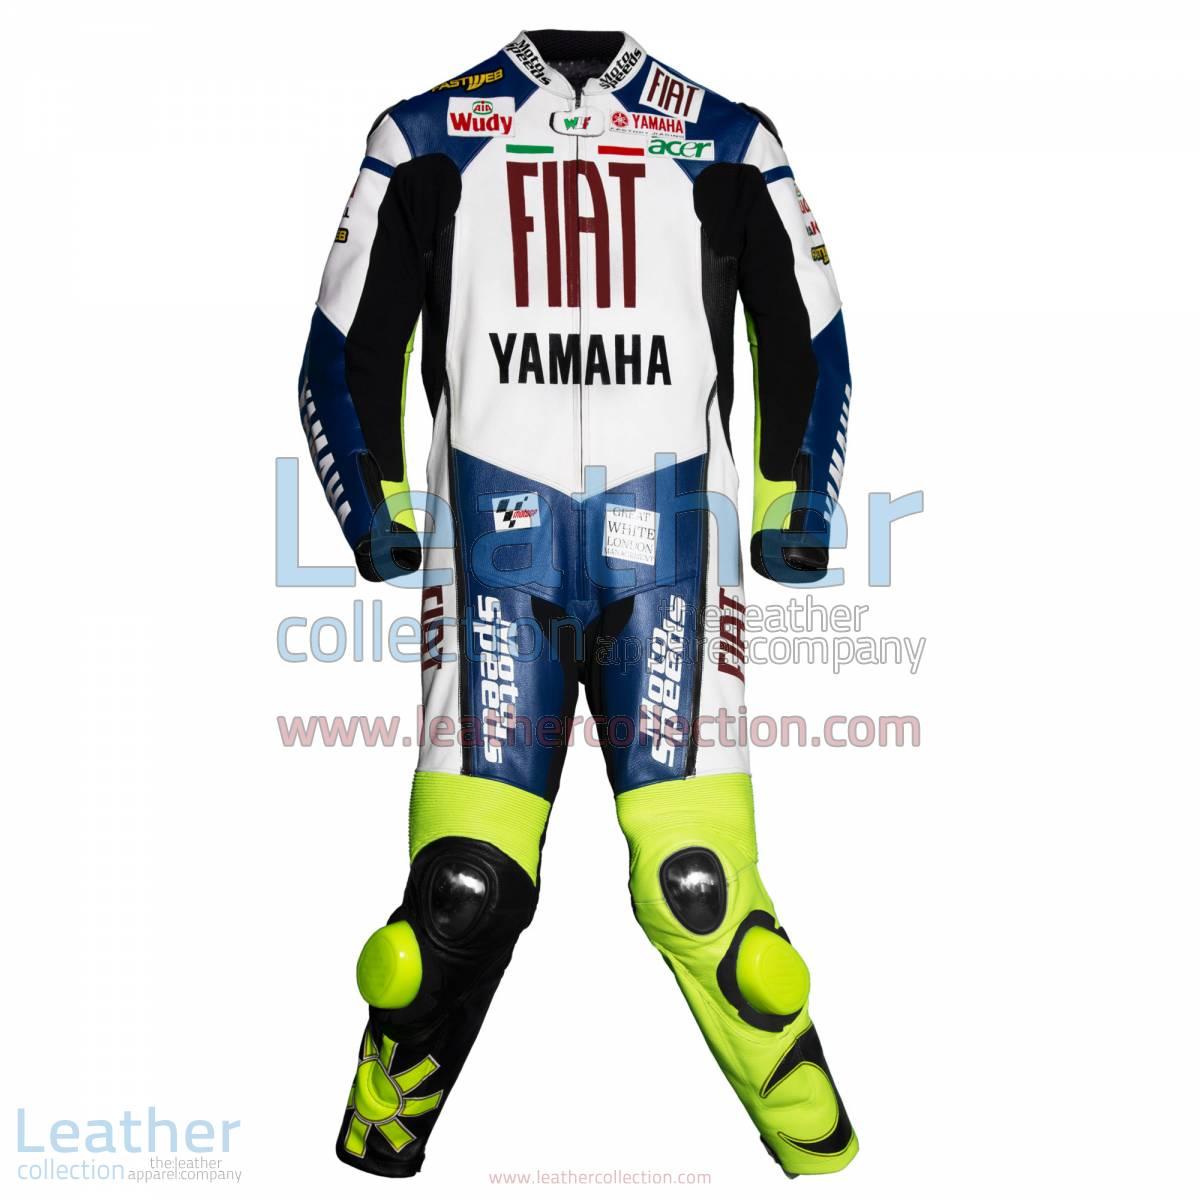 Valentino Rossi Yamaha Fiat MotoGP 2007 Leathers | valentino rossi leathers